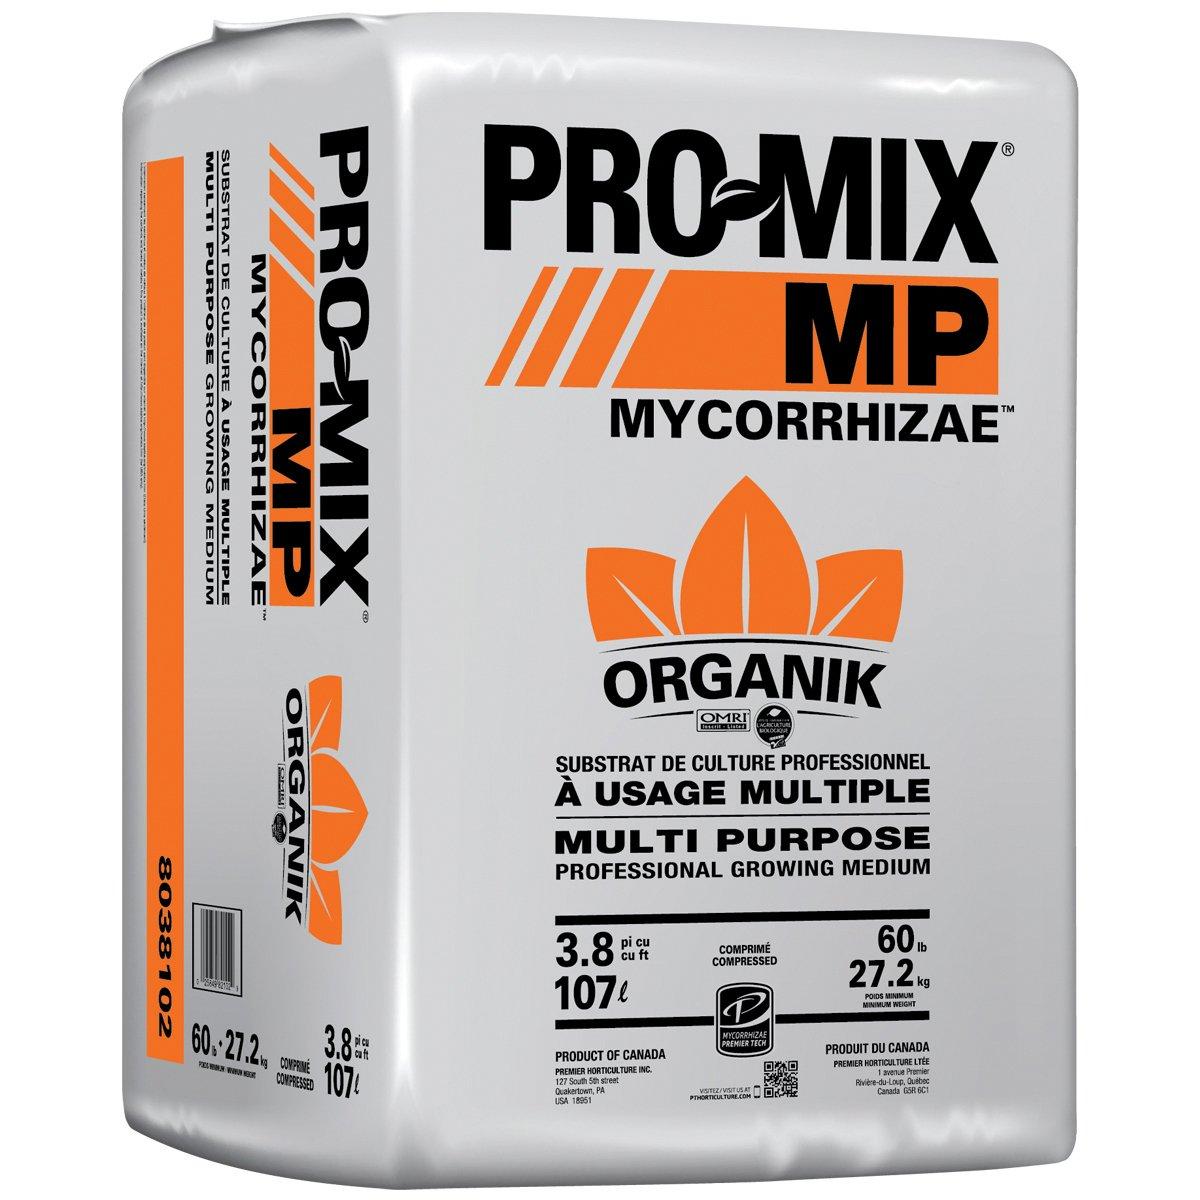 Premier Horticulture 3.8CF Pro Mix MP Mycorrhizae Organic